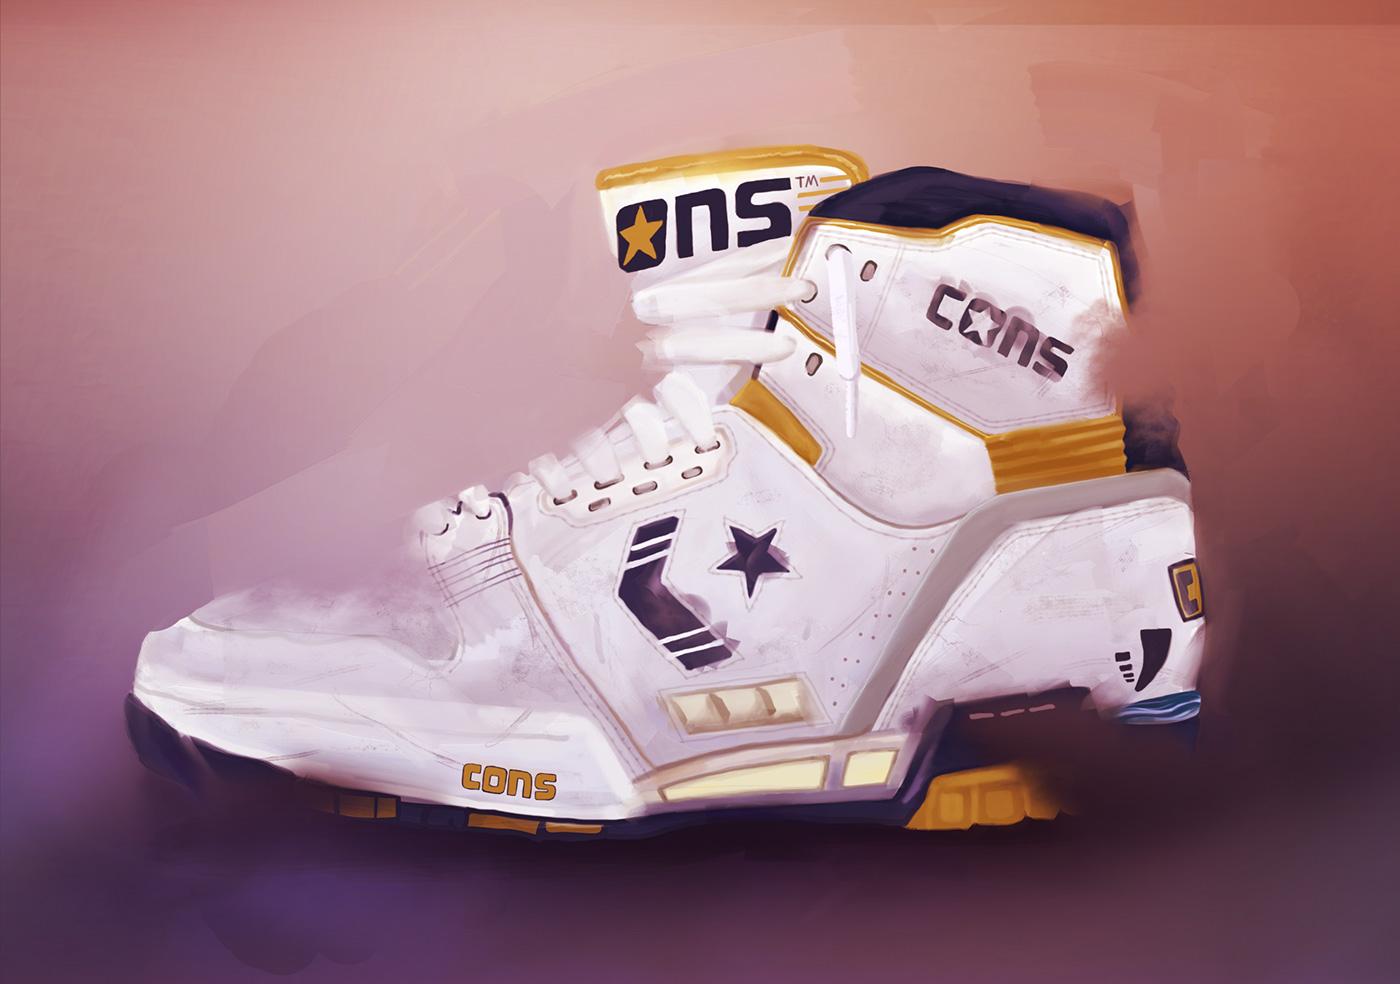 sports shoes ac10c 58bca New Balance, M 576 NGA, 20th Anniversary Vintage Edition, 2008 2. Nike, Air  Jordan V, 1990 and 2000 3. Converse, Cons erx 400, Lakers, 1989